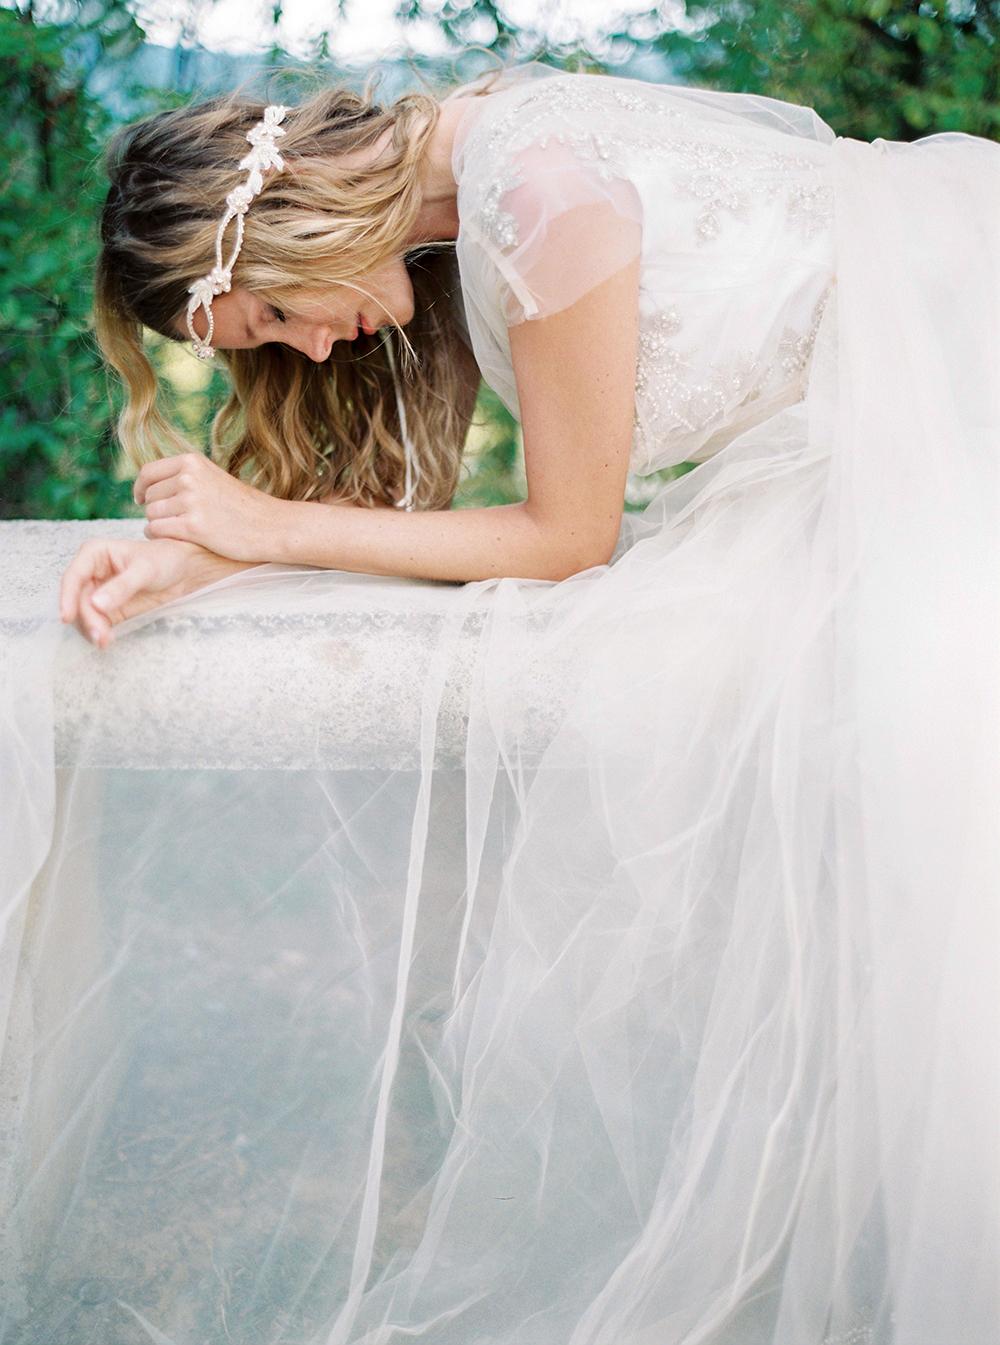 Olga_Plakitina_Photography_023.jpg